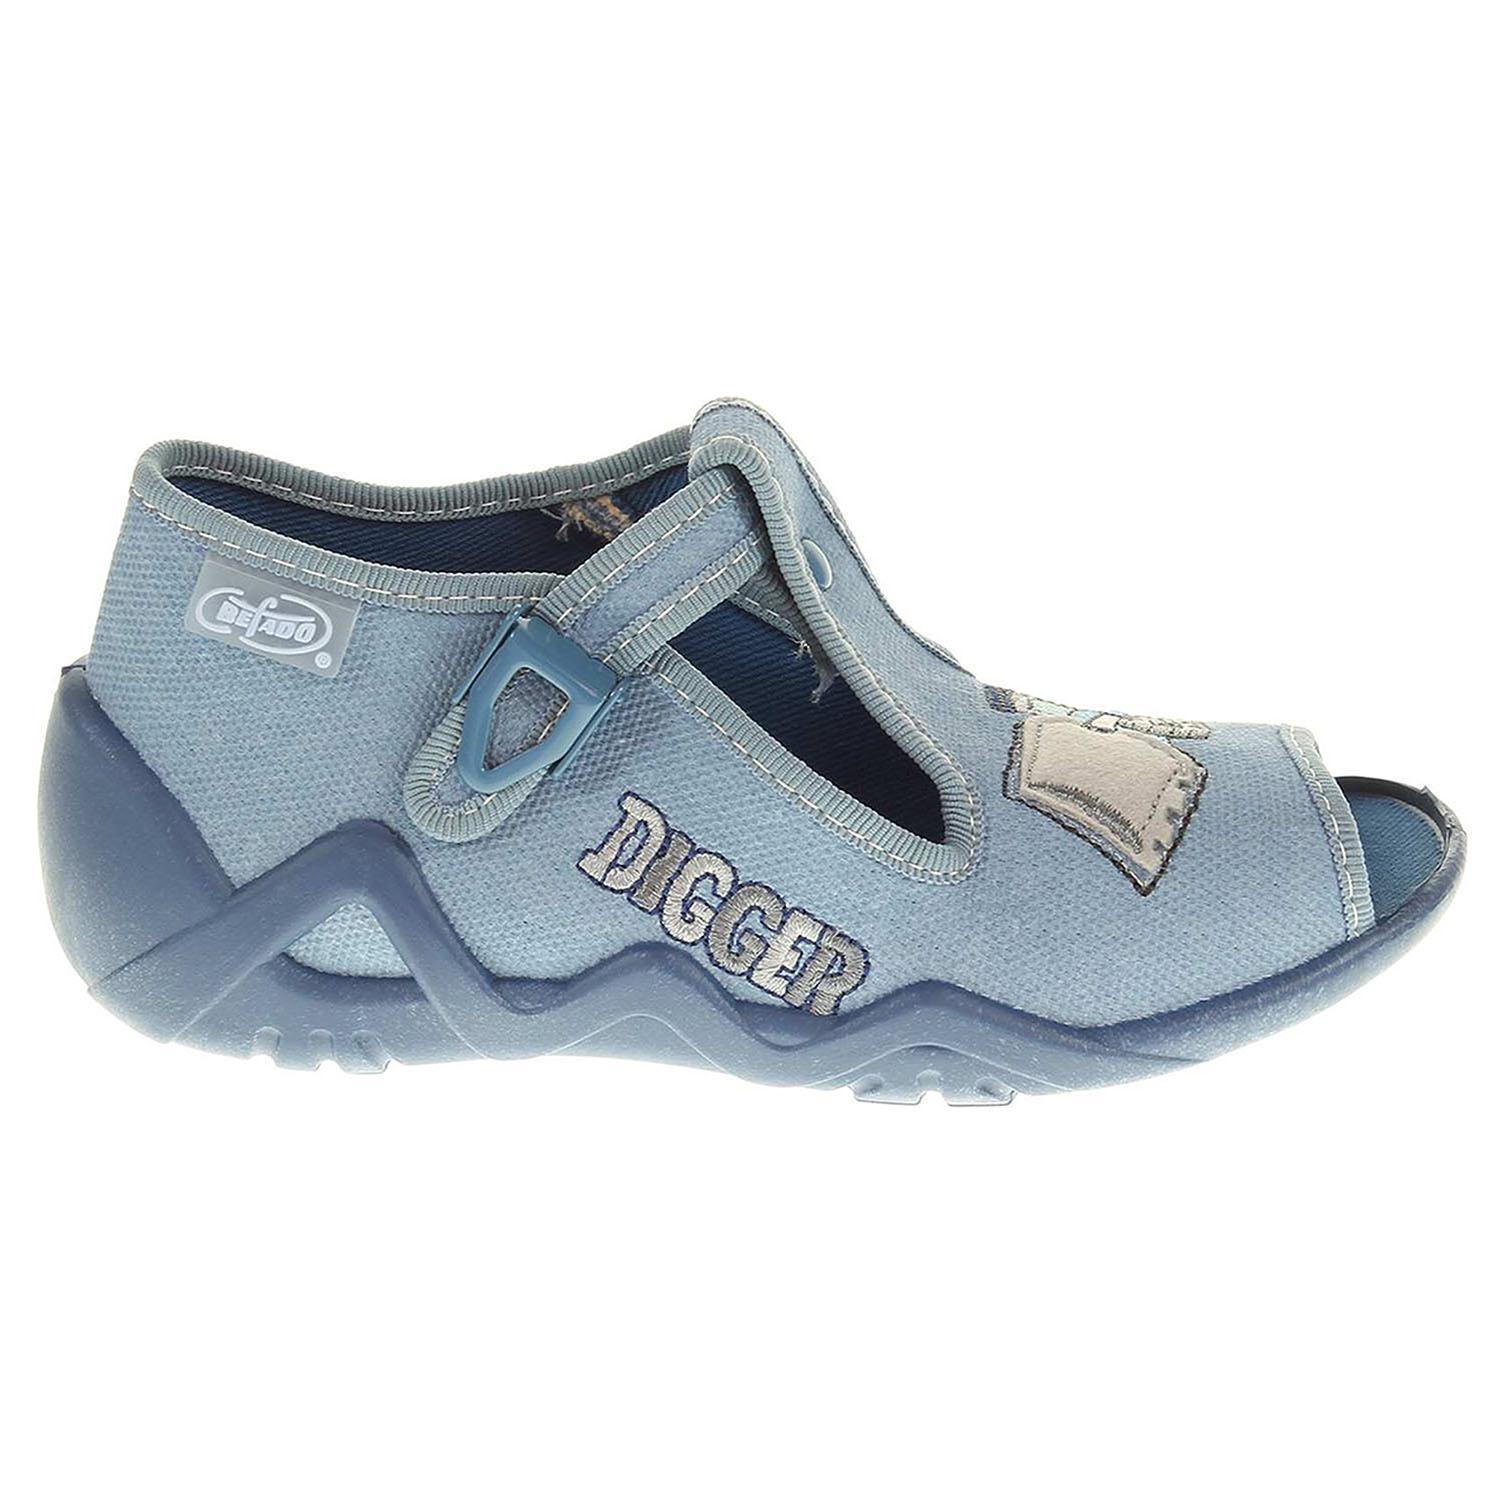 Befado chlapecké bačkory 217P071 modré 24